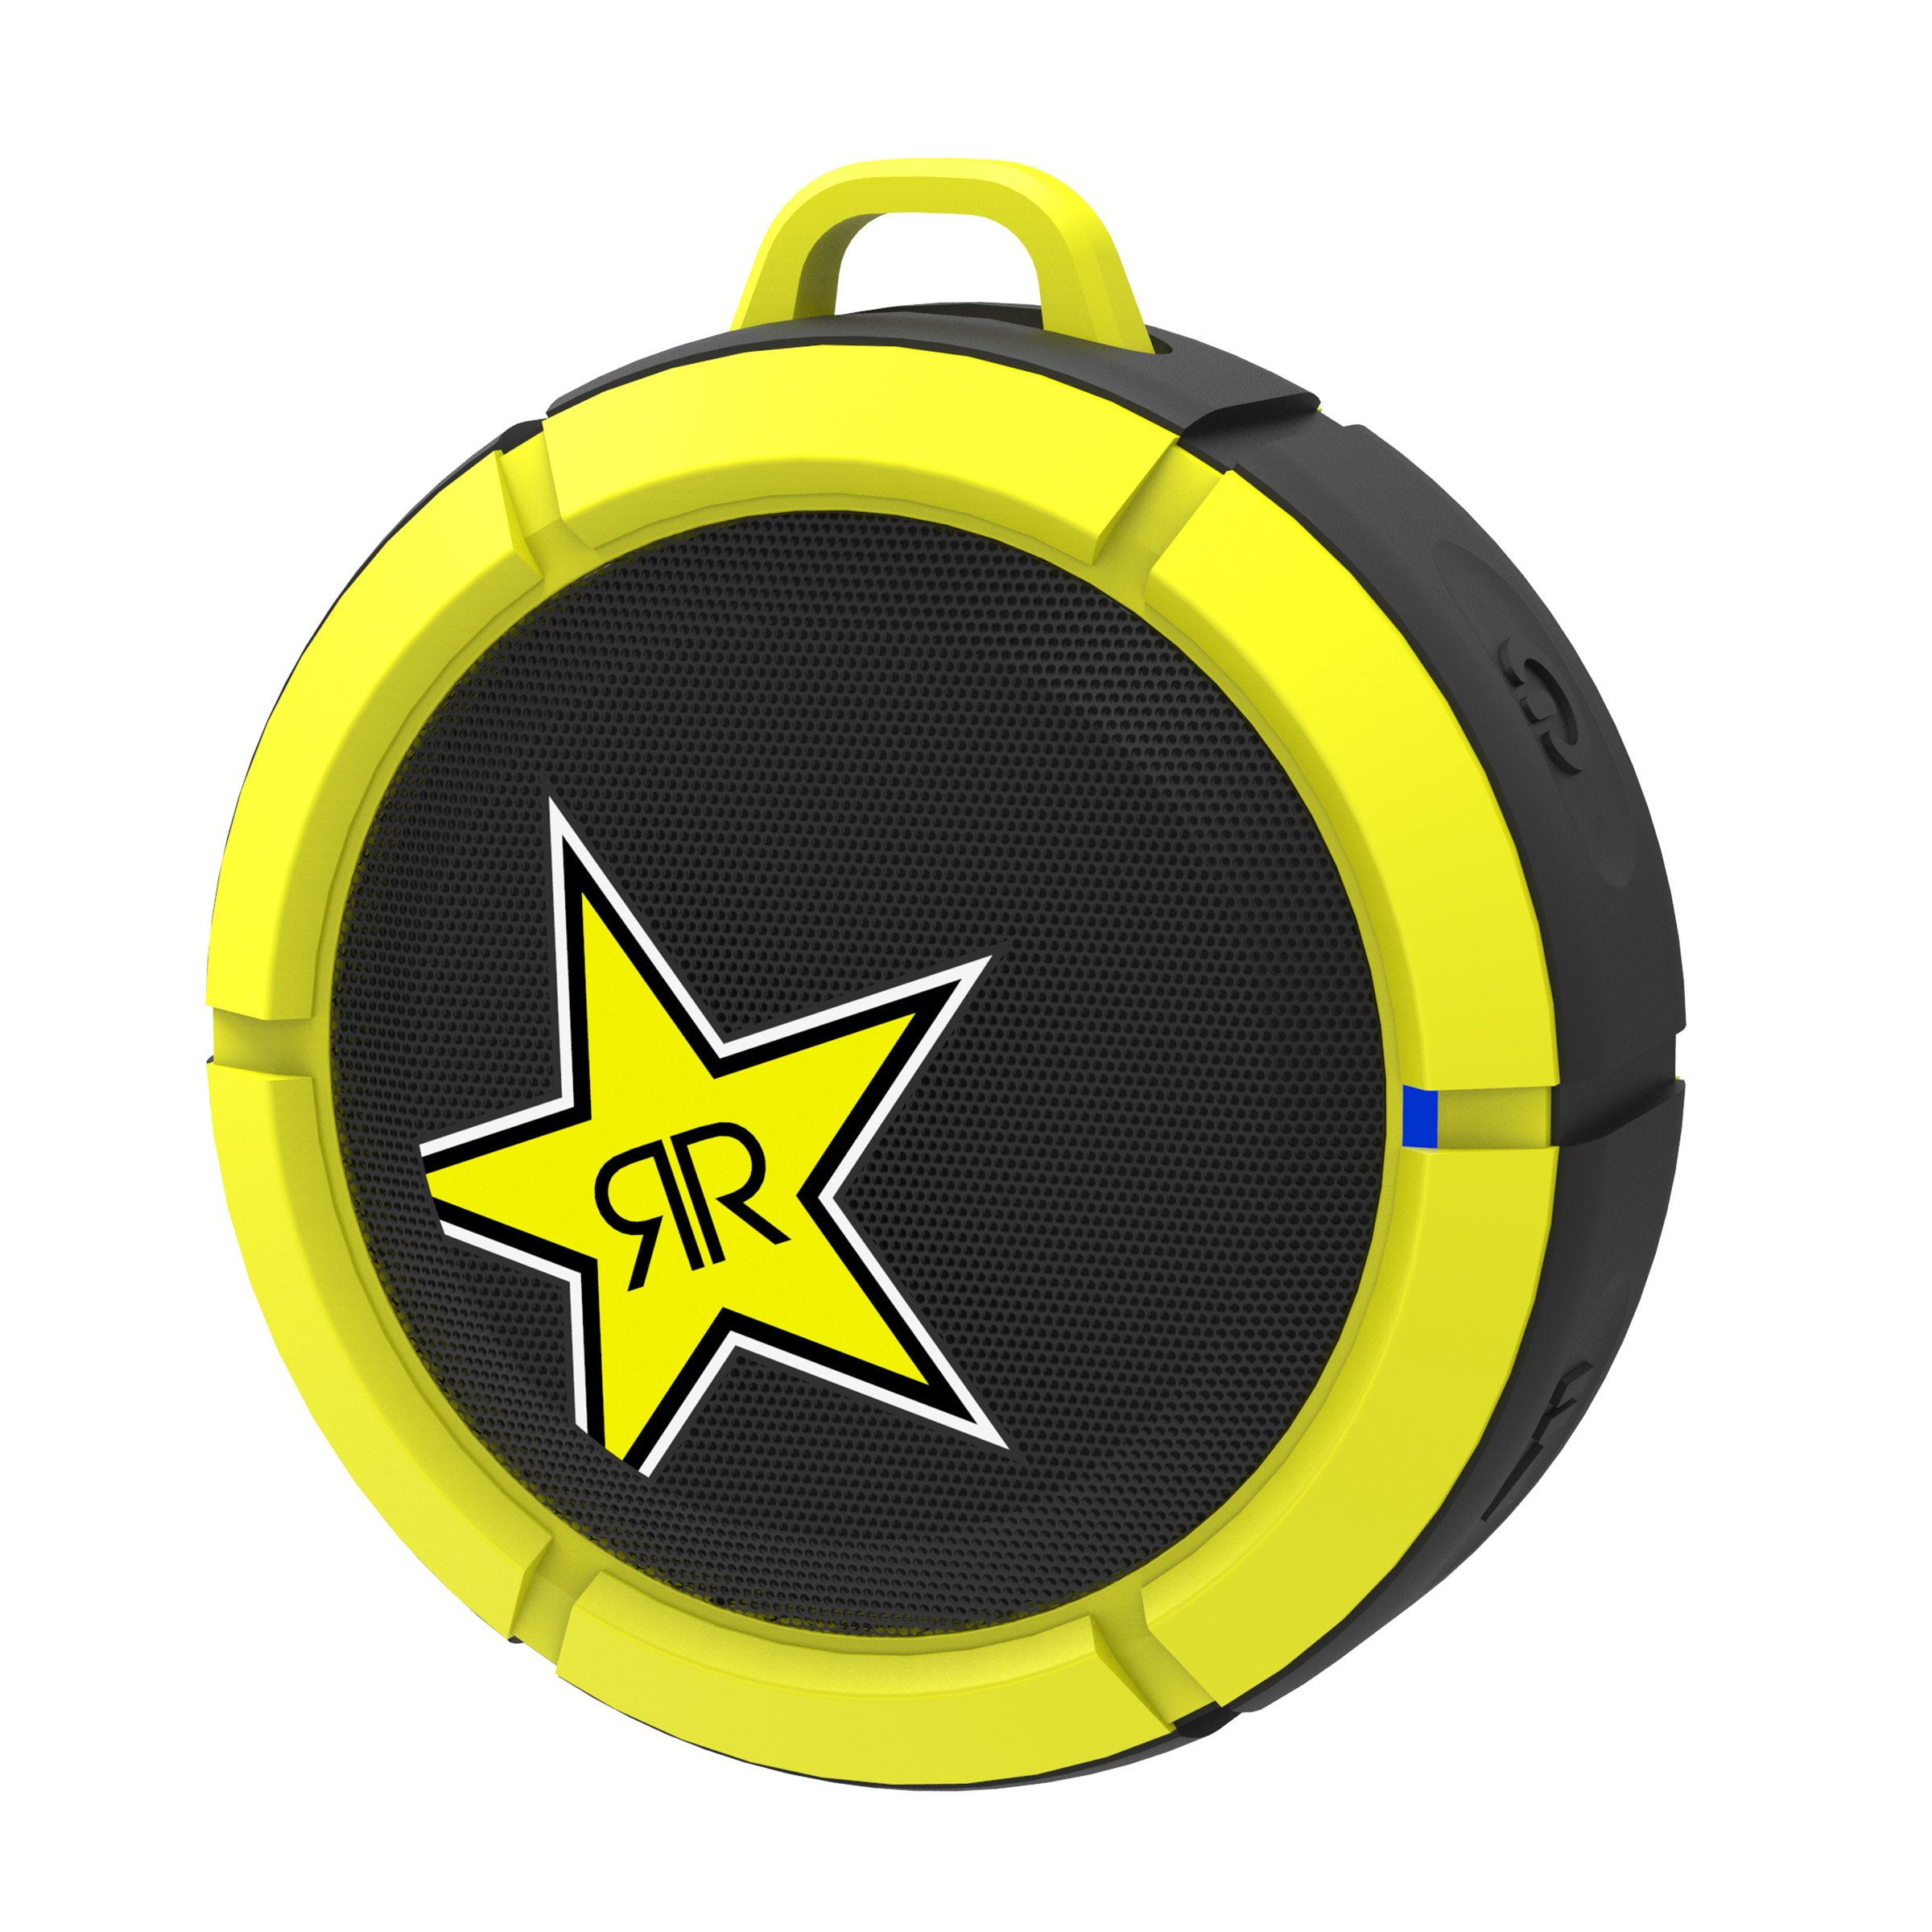 SCOSCHE BoomBuoy Rugged Waterproof Portable Wireless...